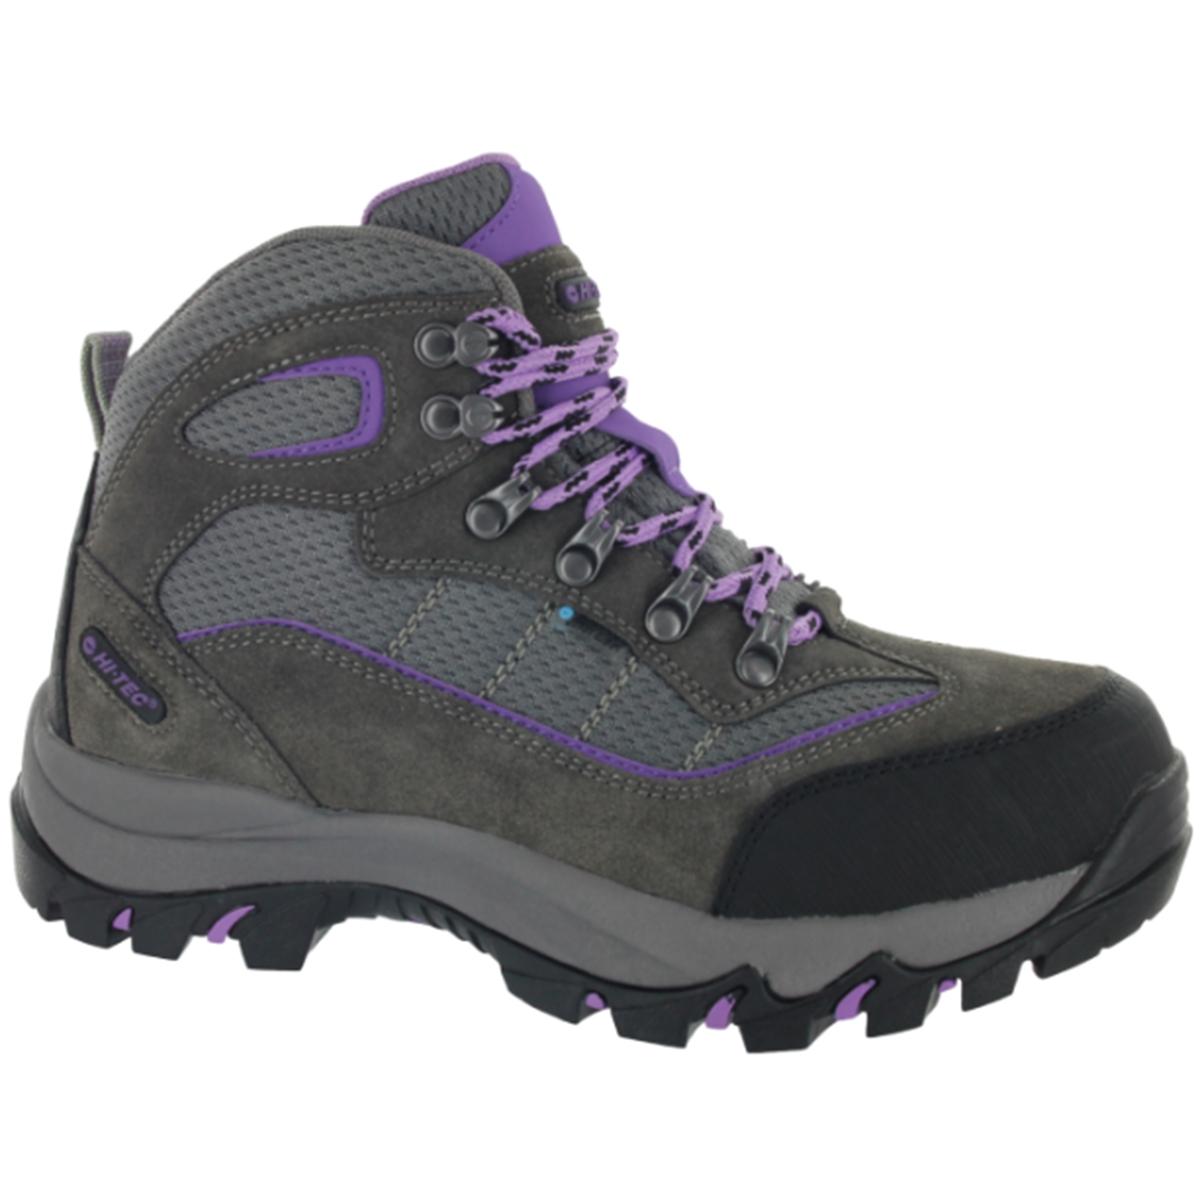 bardzo popularny buty do biegania wylot online HI-TEC Women's Skamania Mid Waterproof Hiking Boots